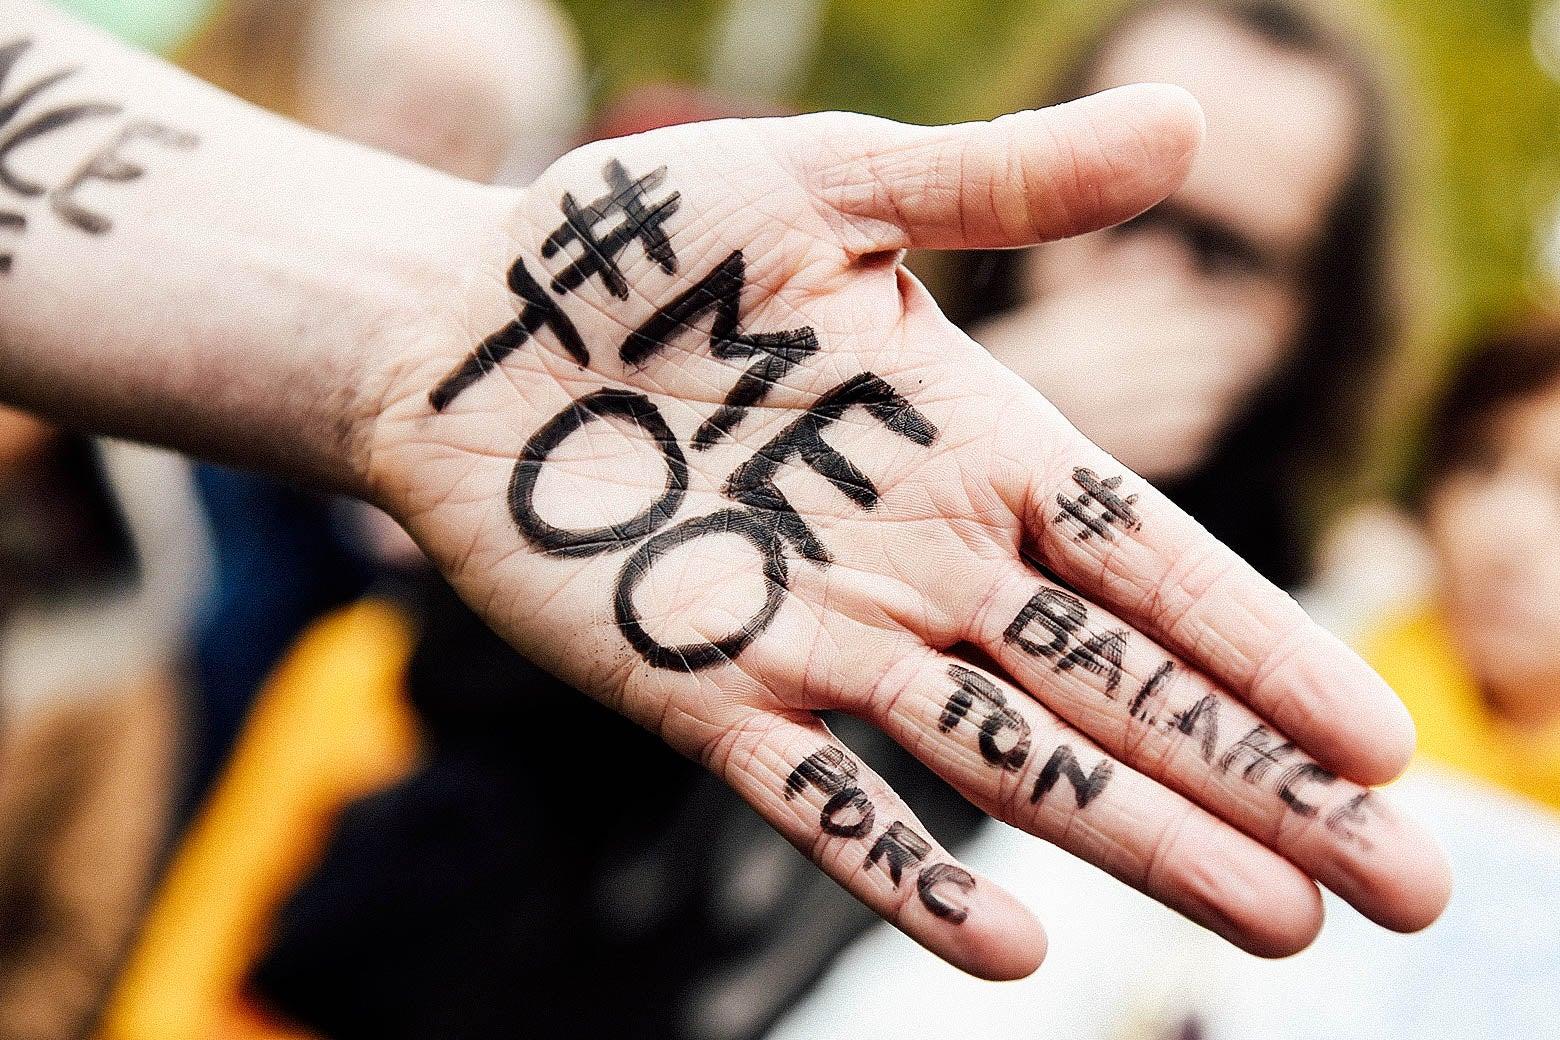 A protestor shows the messages #MeToo and #BalanceTonPorc.